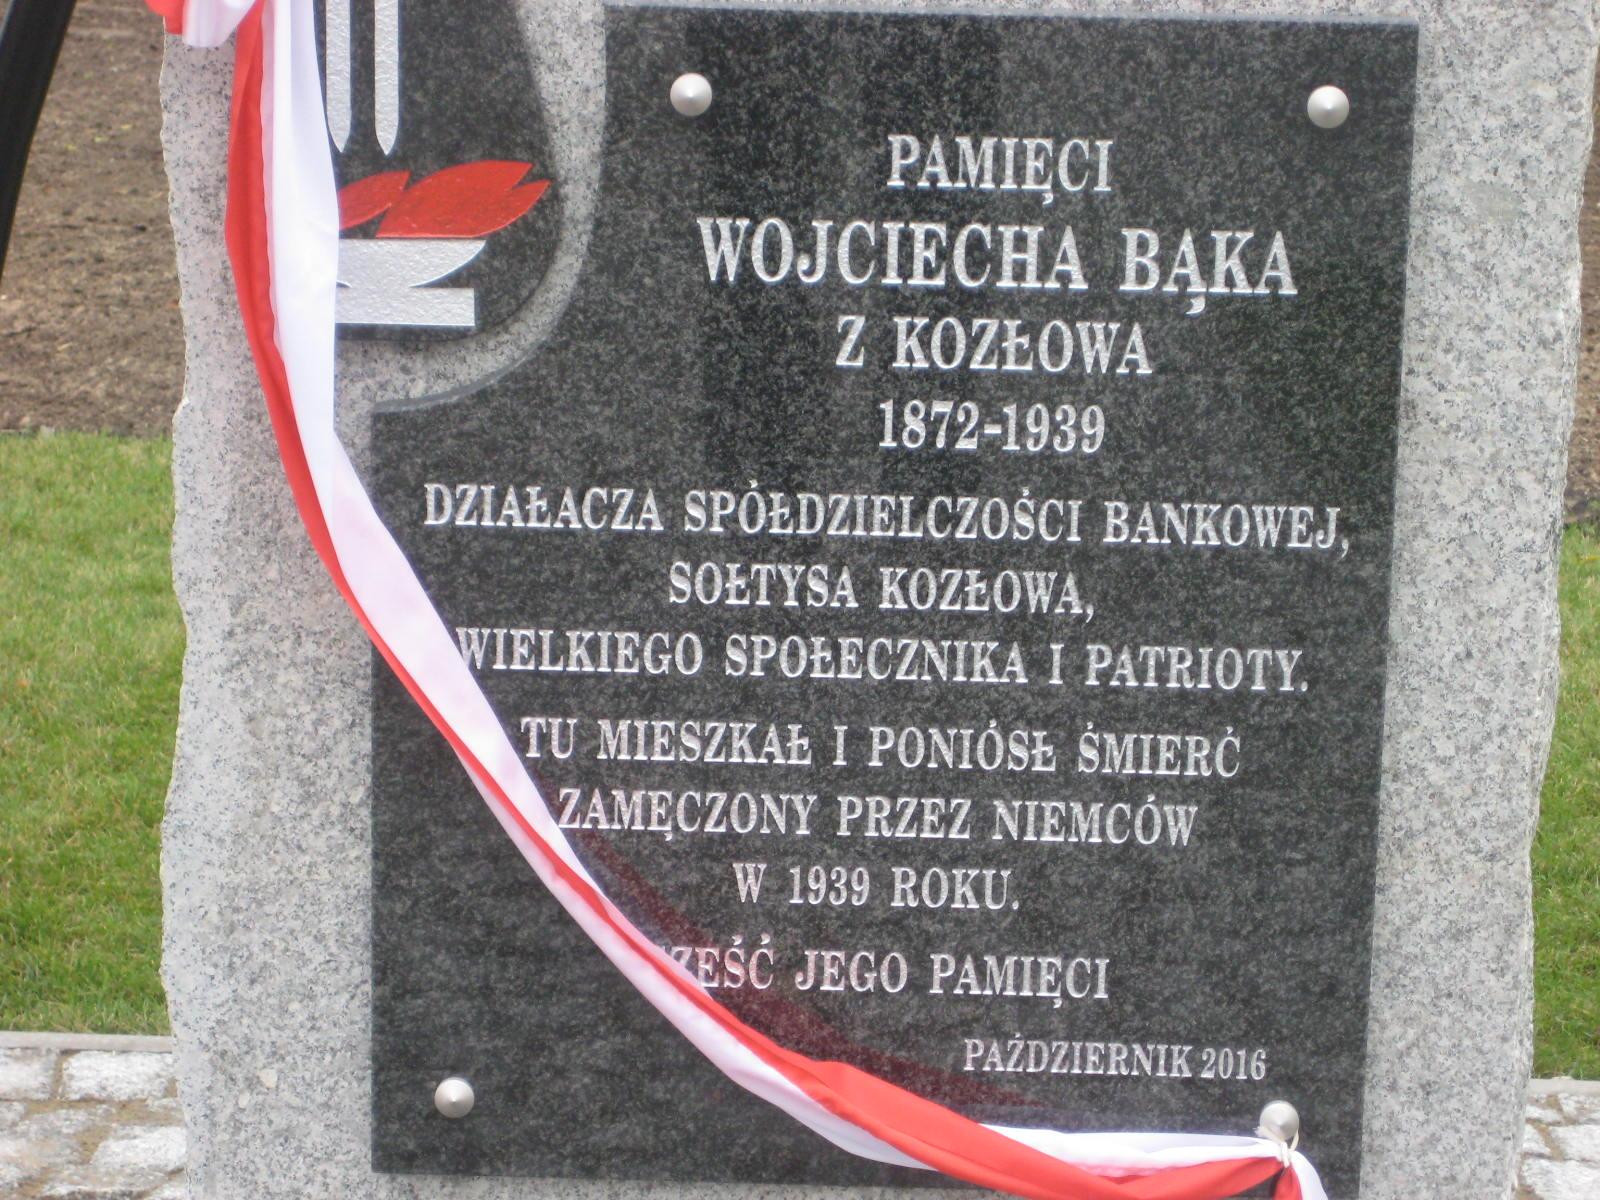 pomnik wojciecha bąka - Rafał Muniak